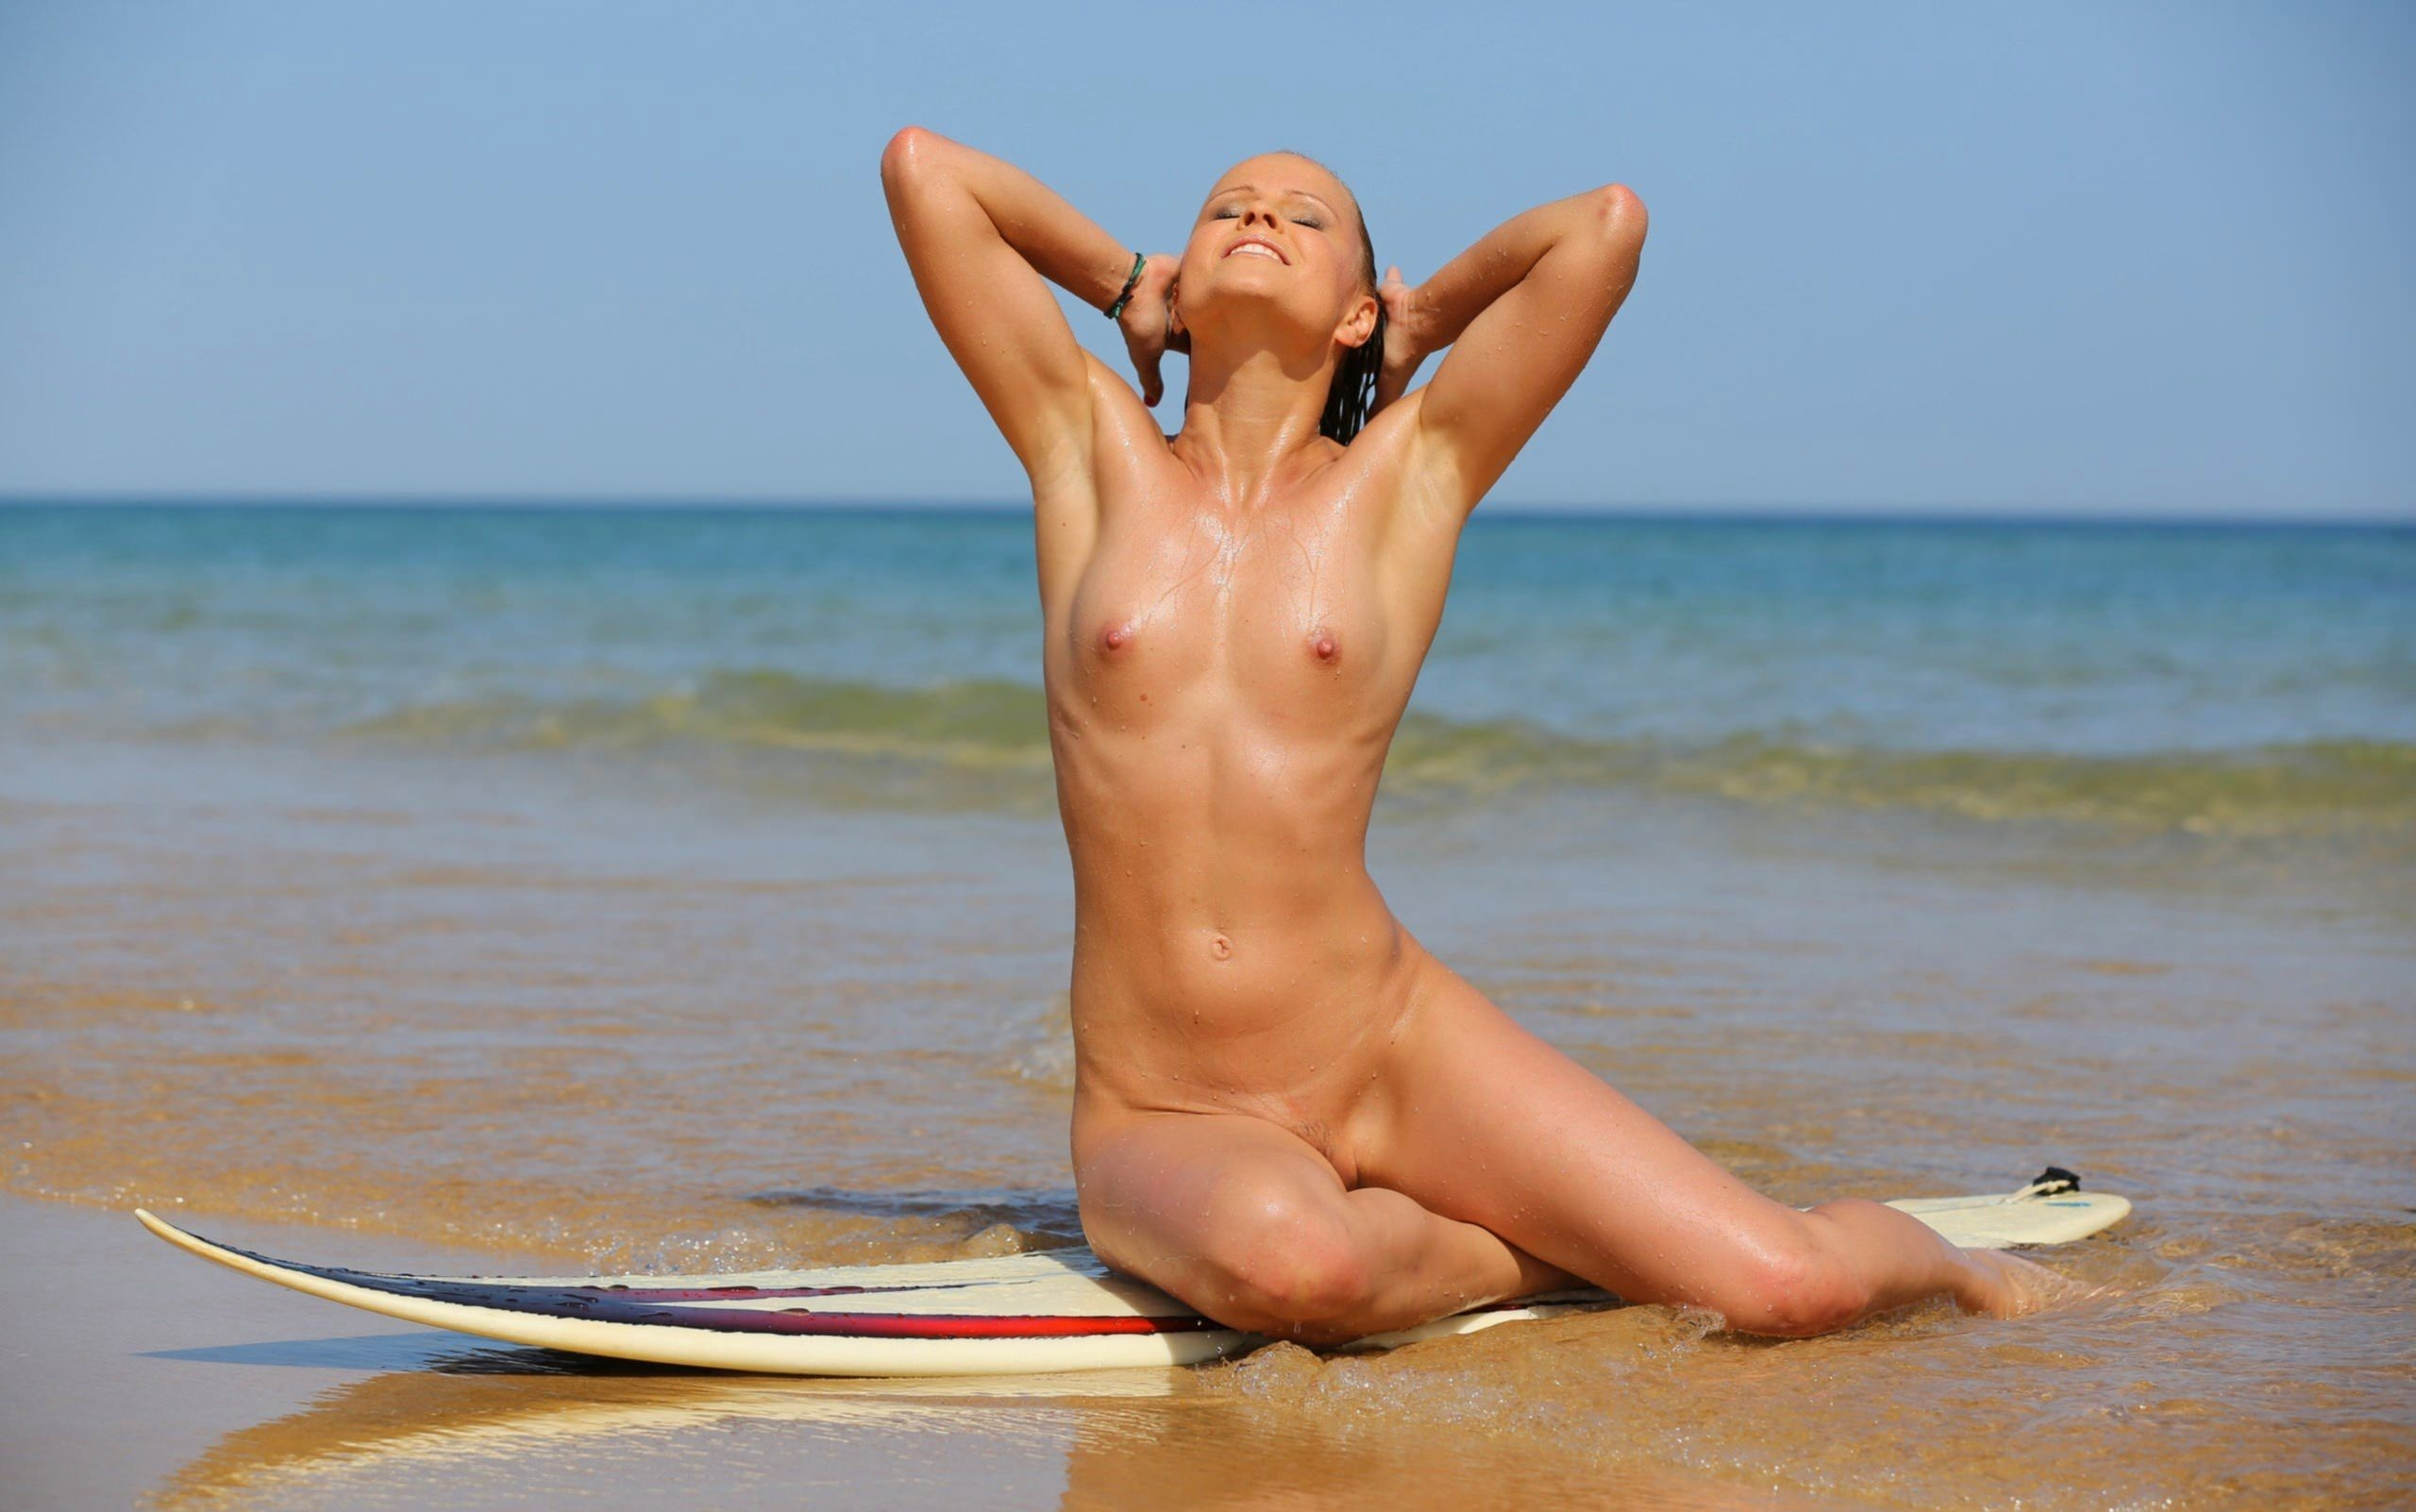 Felicity palmateer releases nude surfing art image skin deep